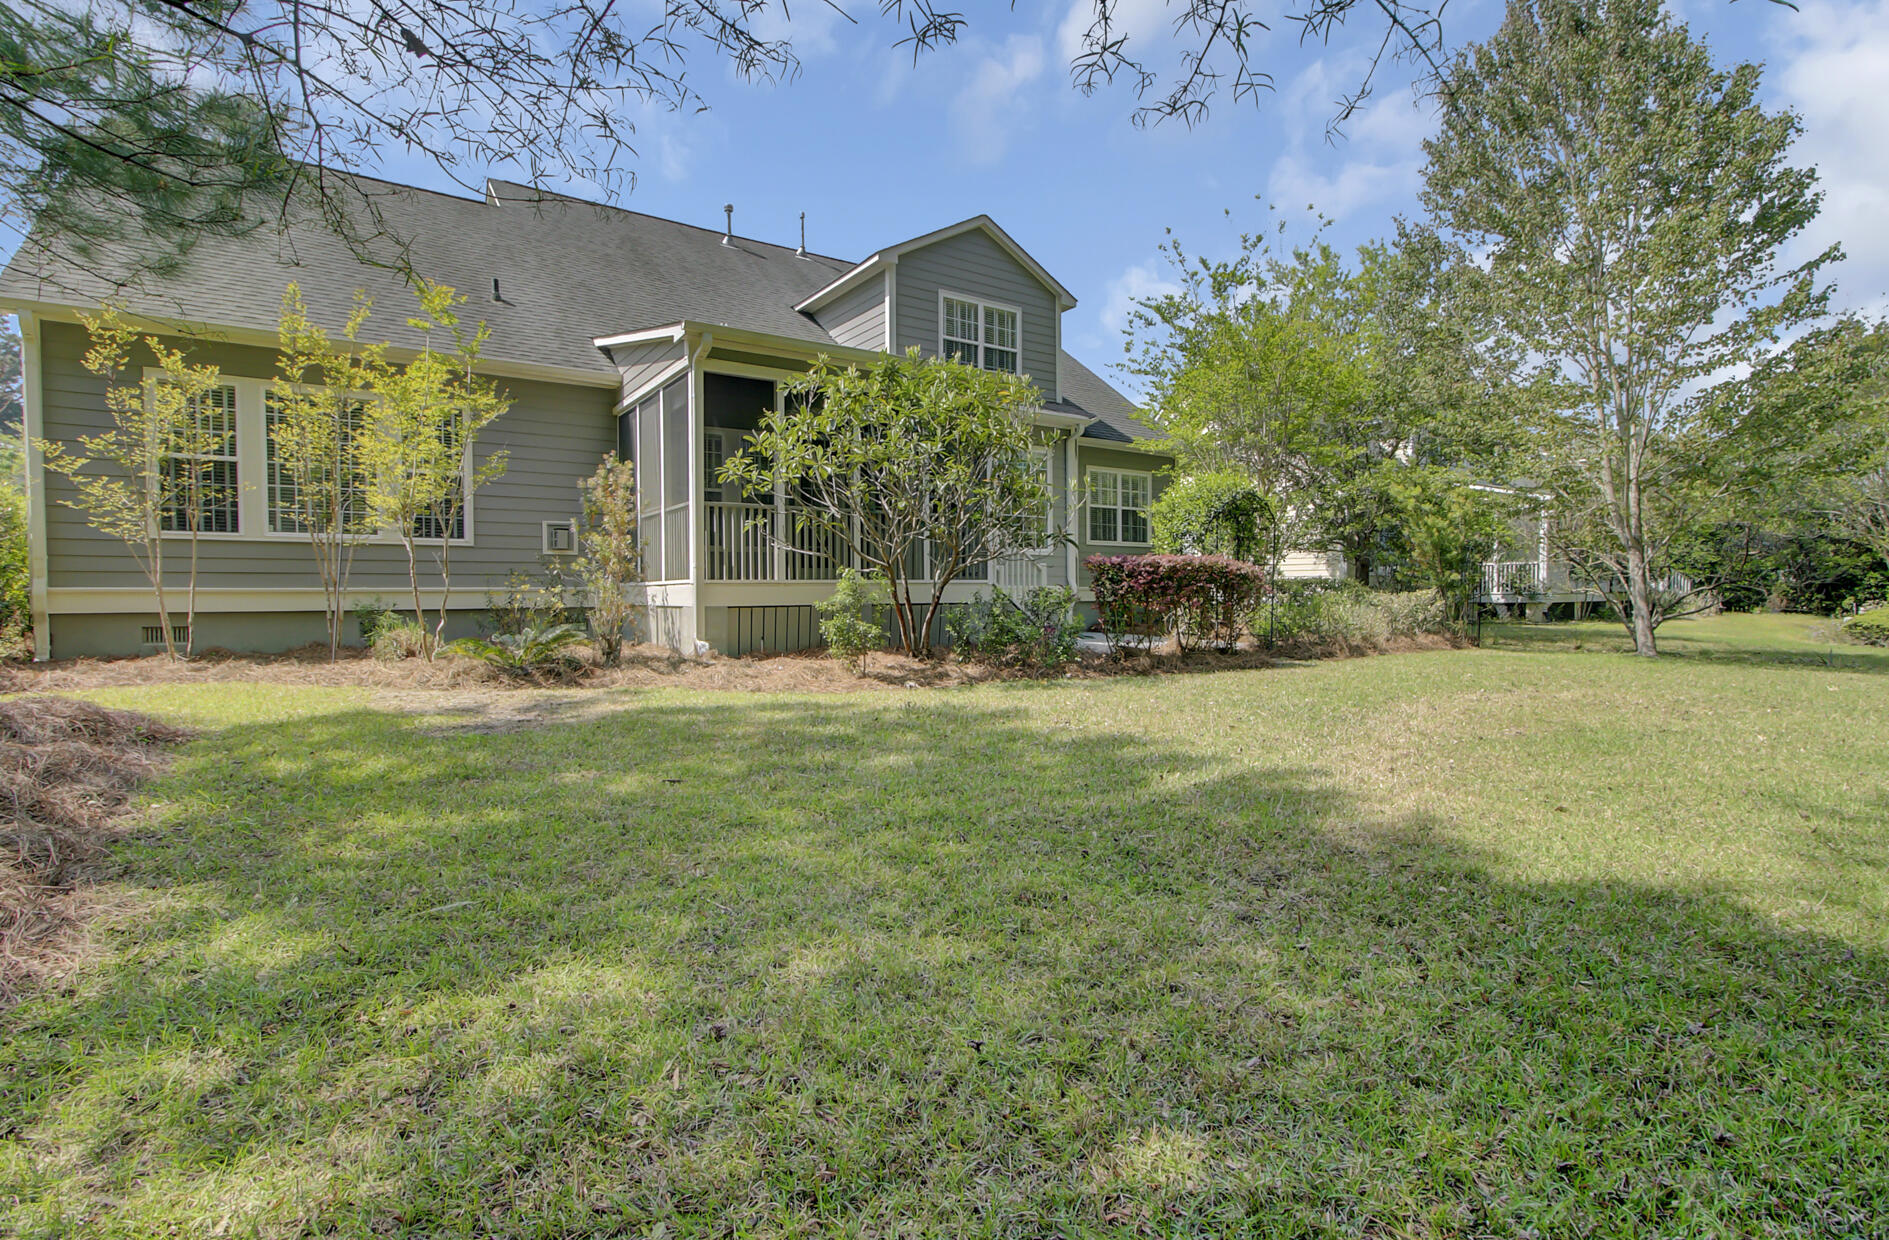 Marsh Cove Homes For Sale - 2928 Riverwood, Mount Pleasant, SC - 0